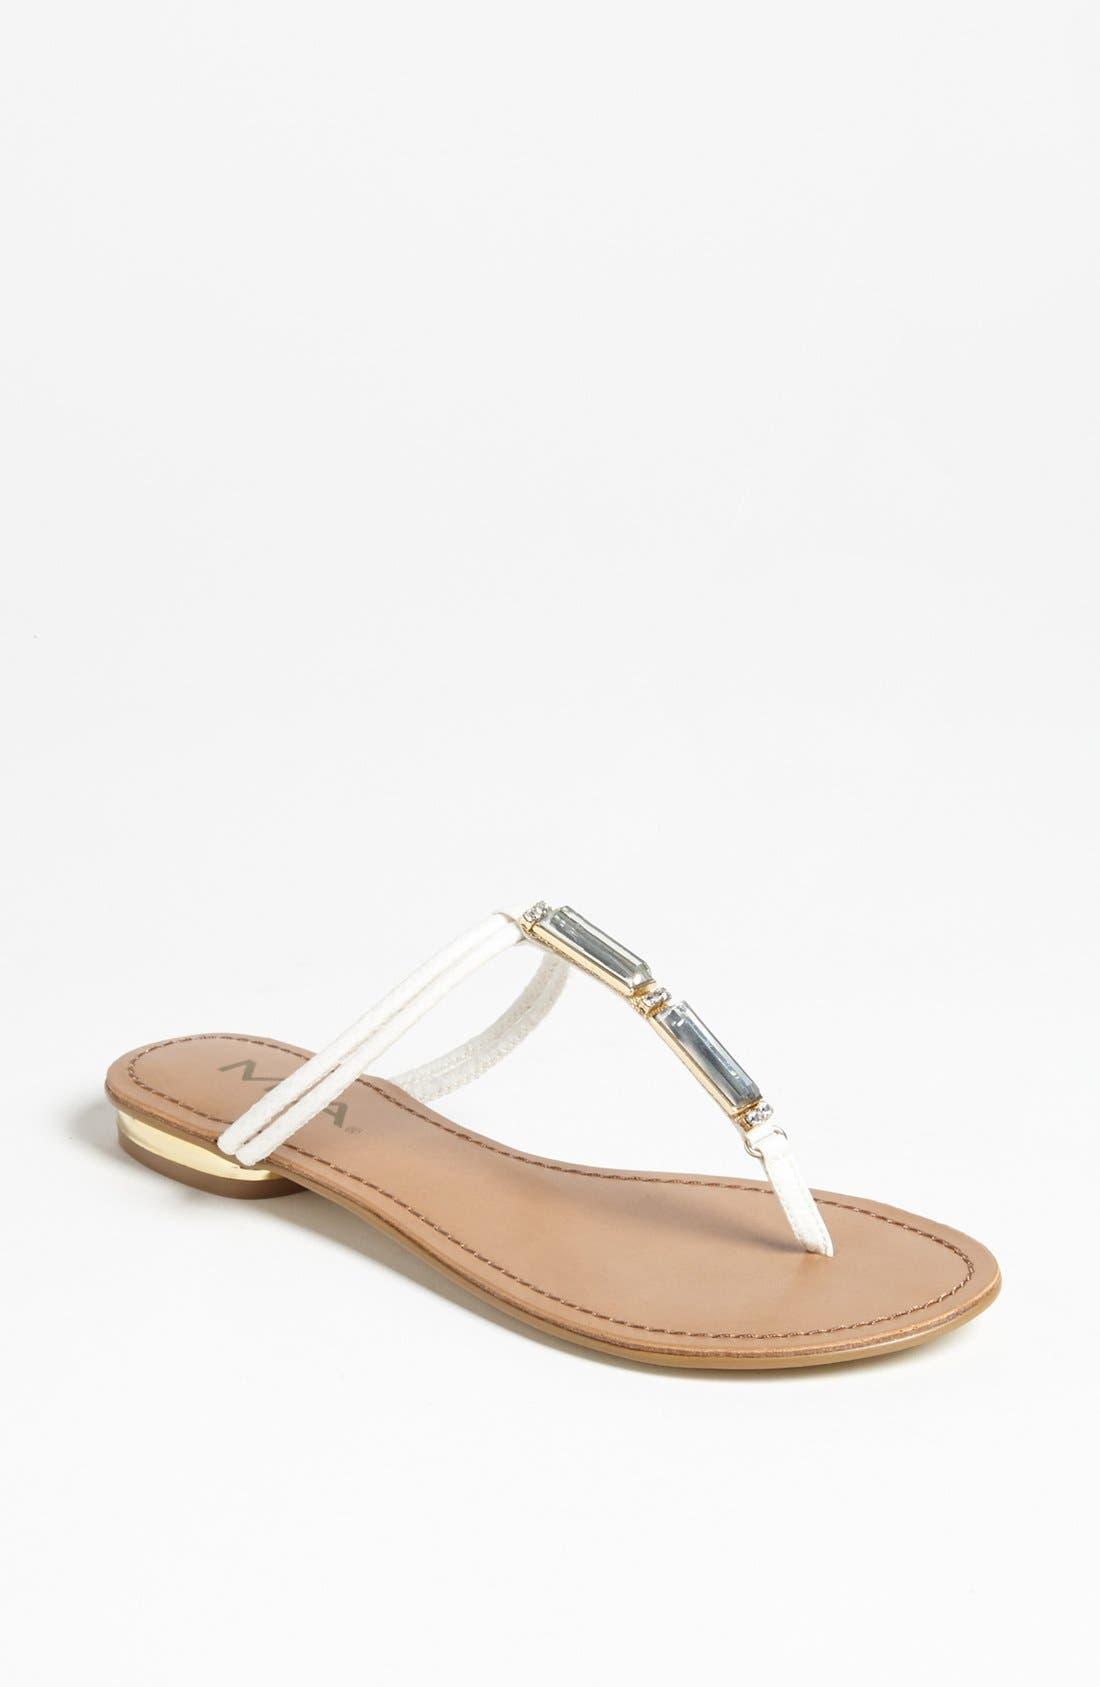 Main Image - MIA 'Jimena' Sandal